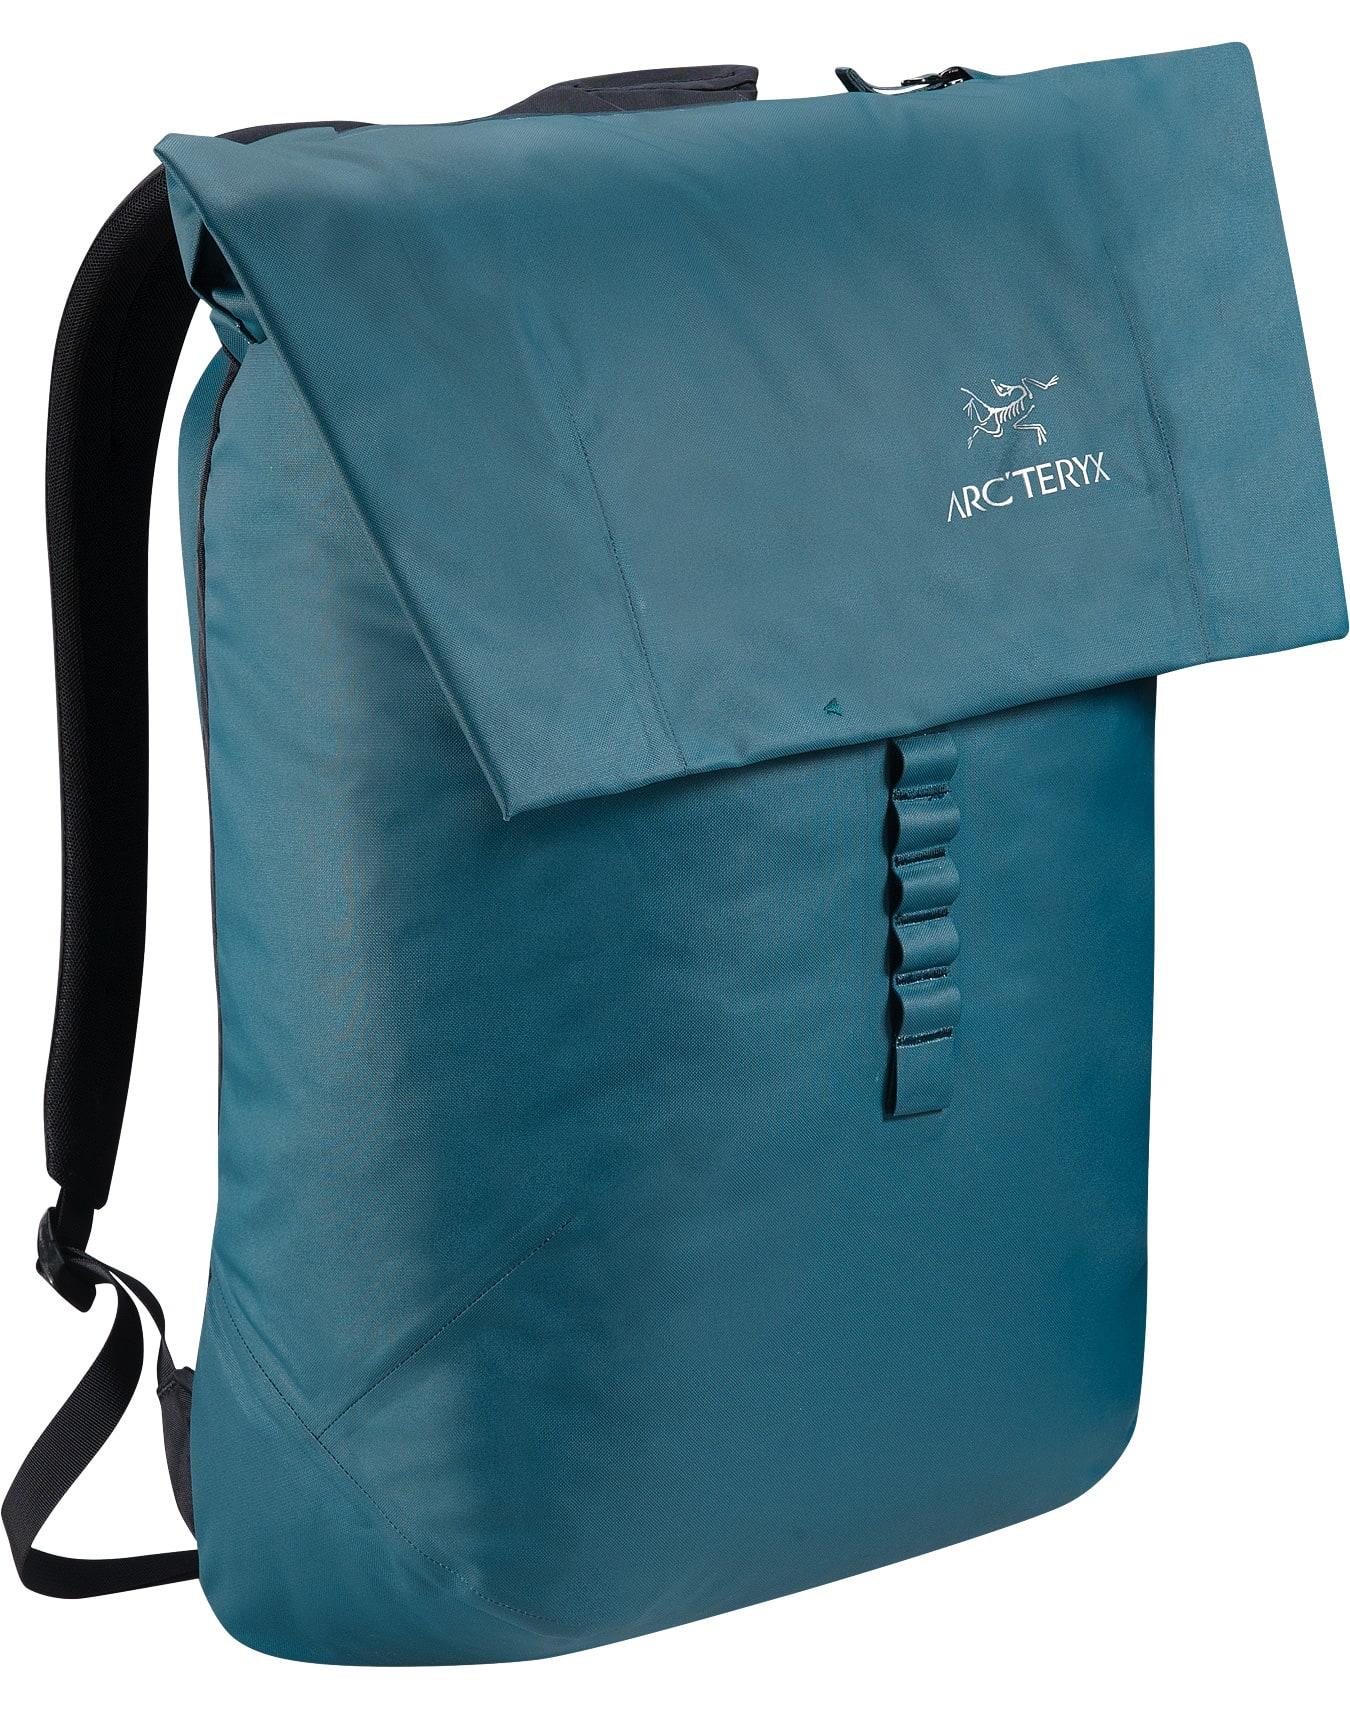 Image of Arc'teryx Granville Backpack